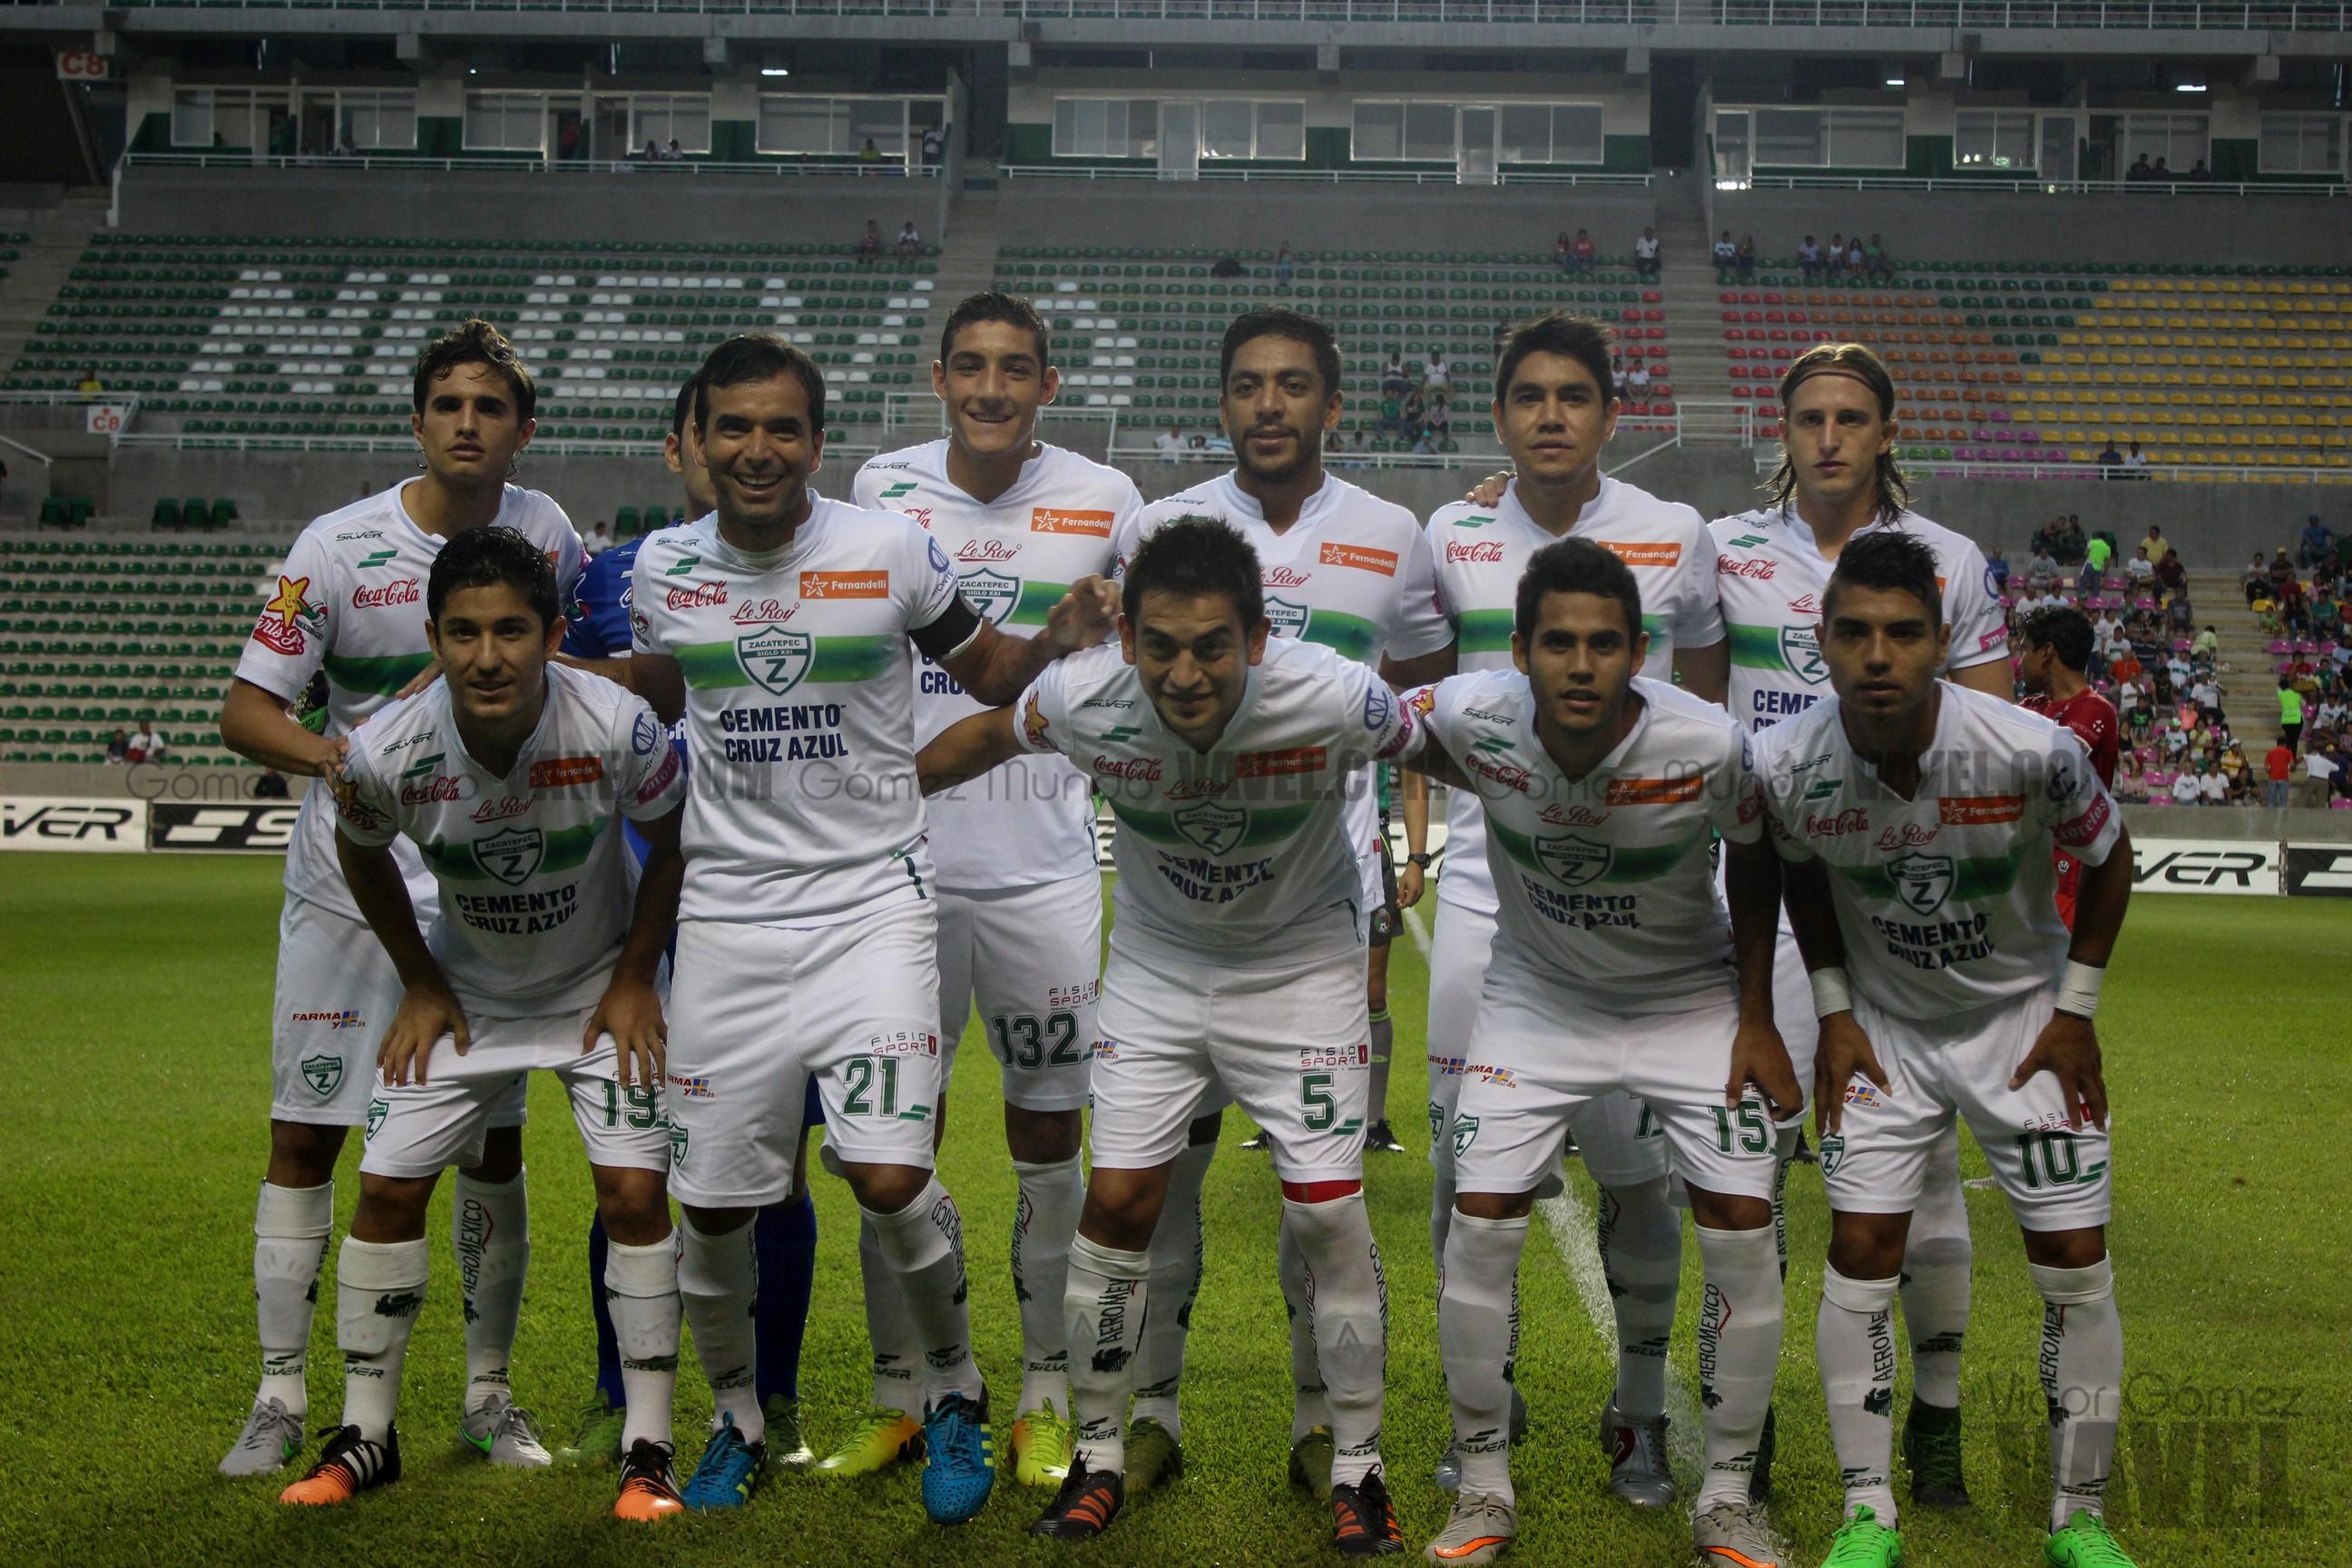 (Titulares de Zacatepec ante Coras de Tepic)